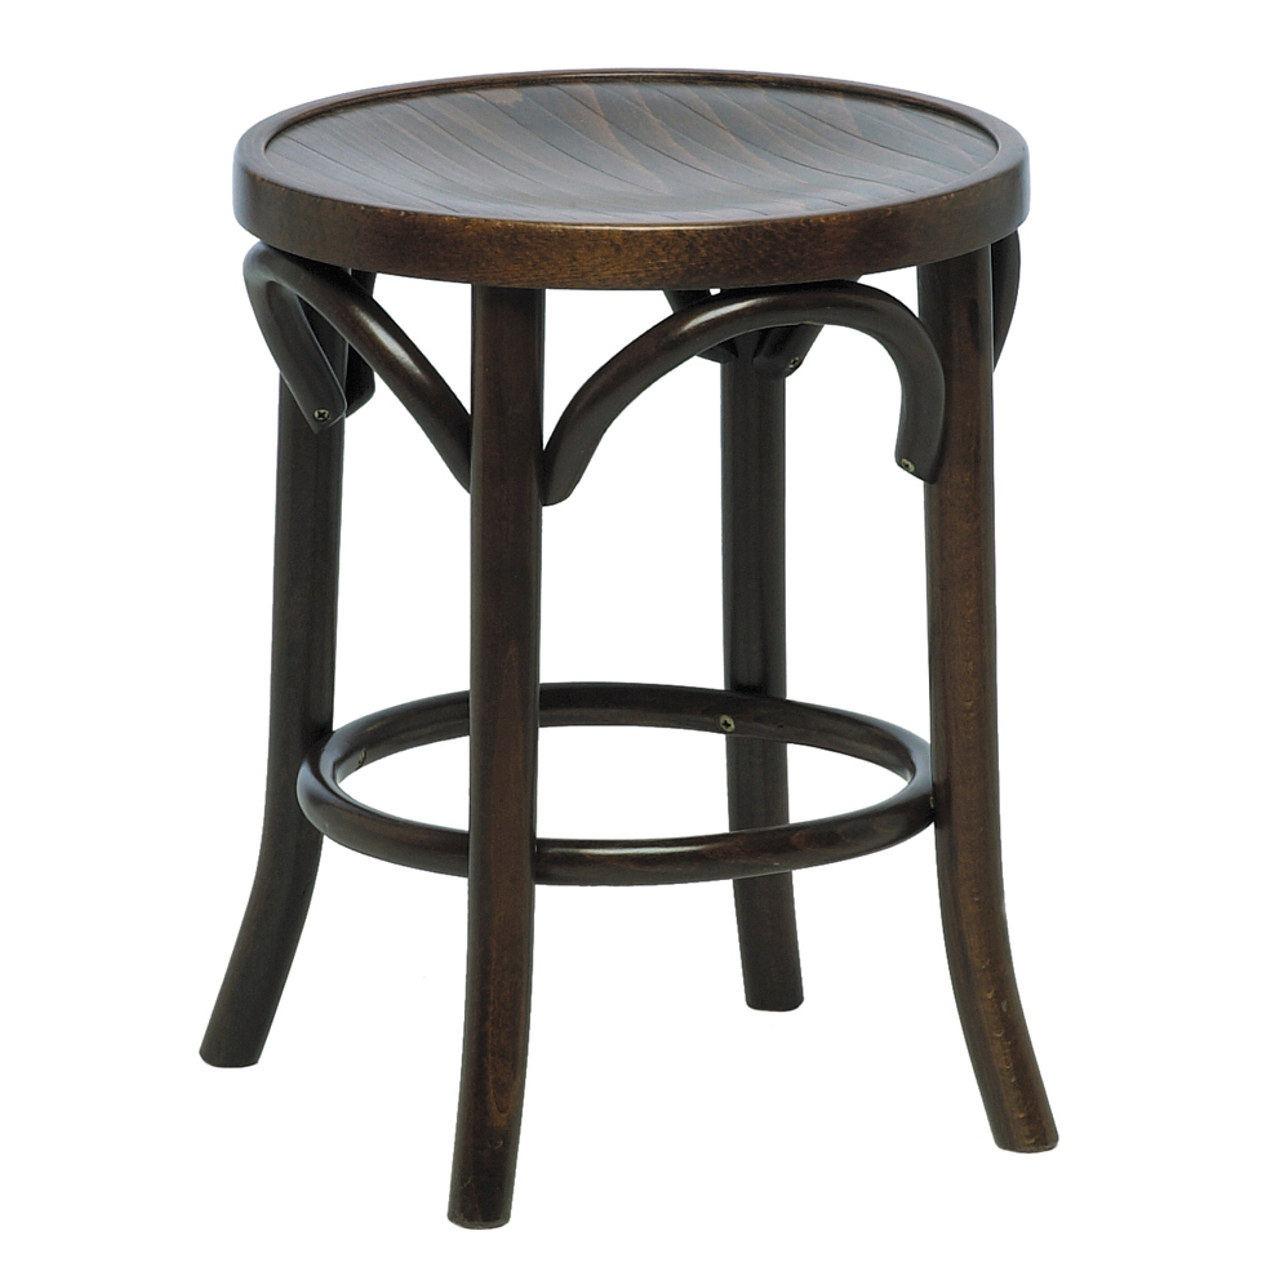 Bentwood low stool